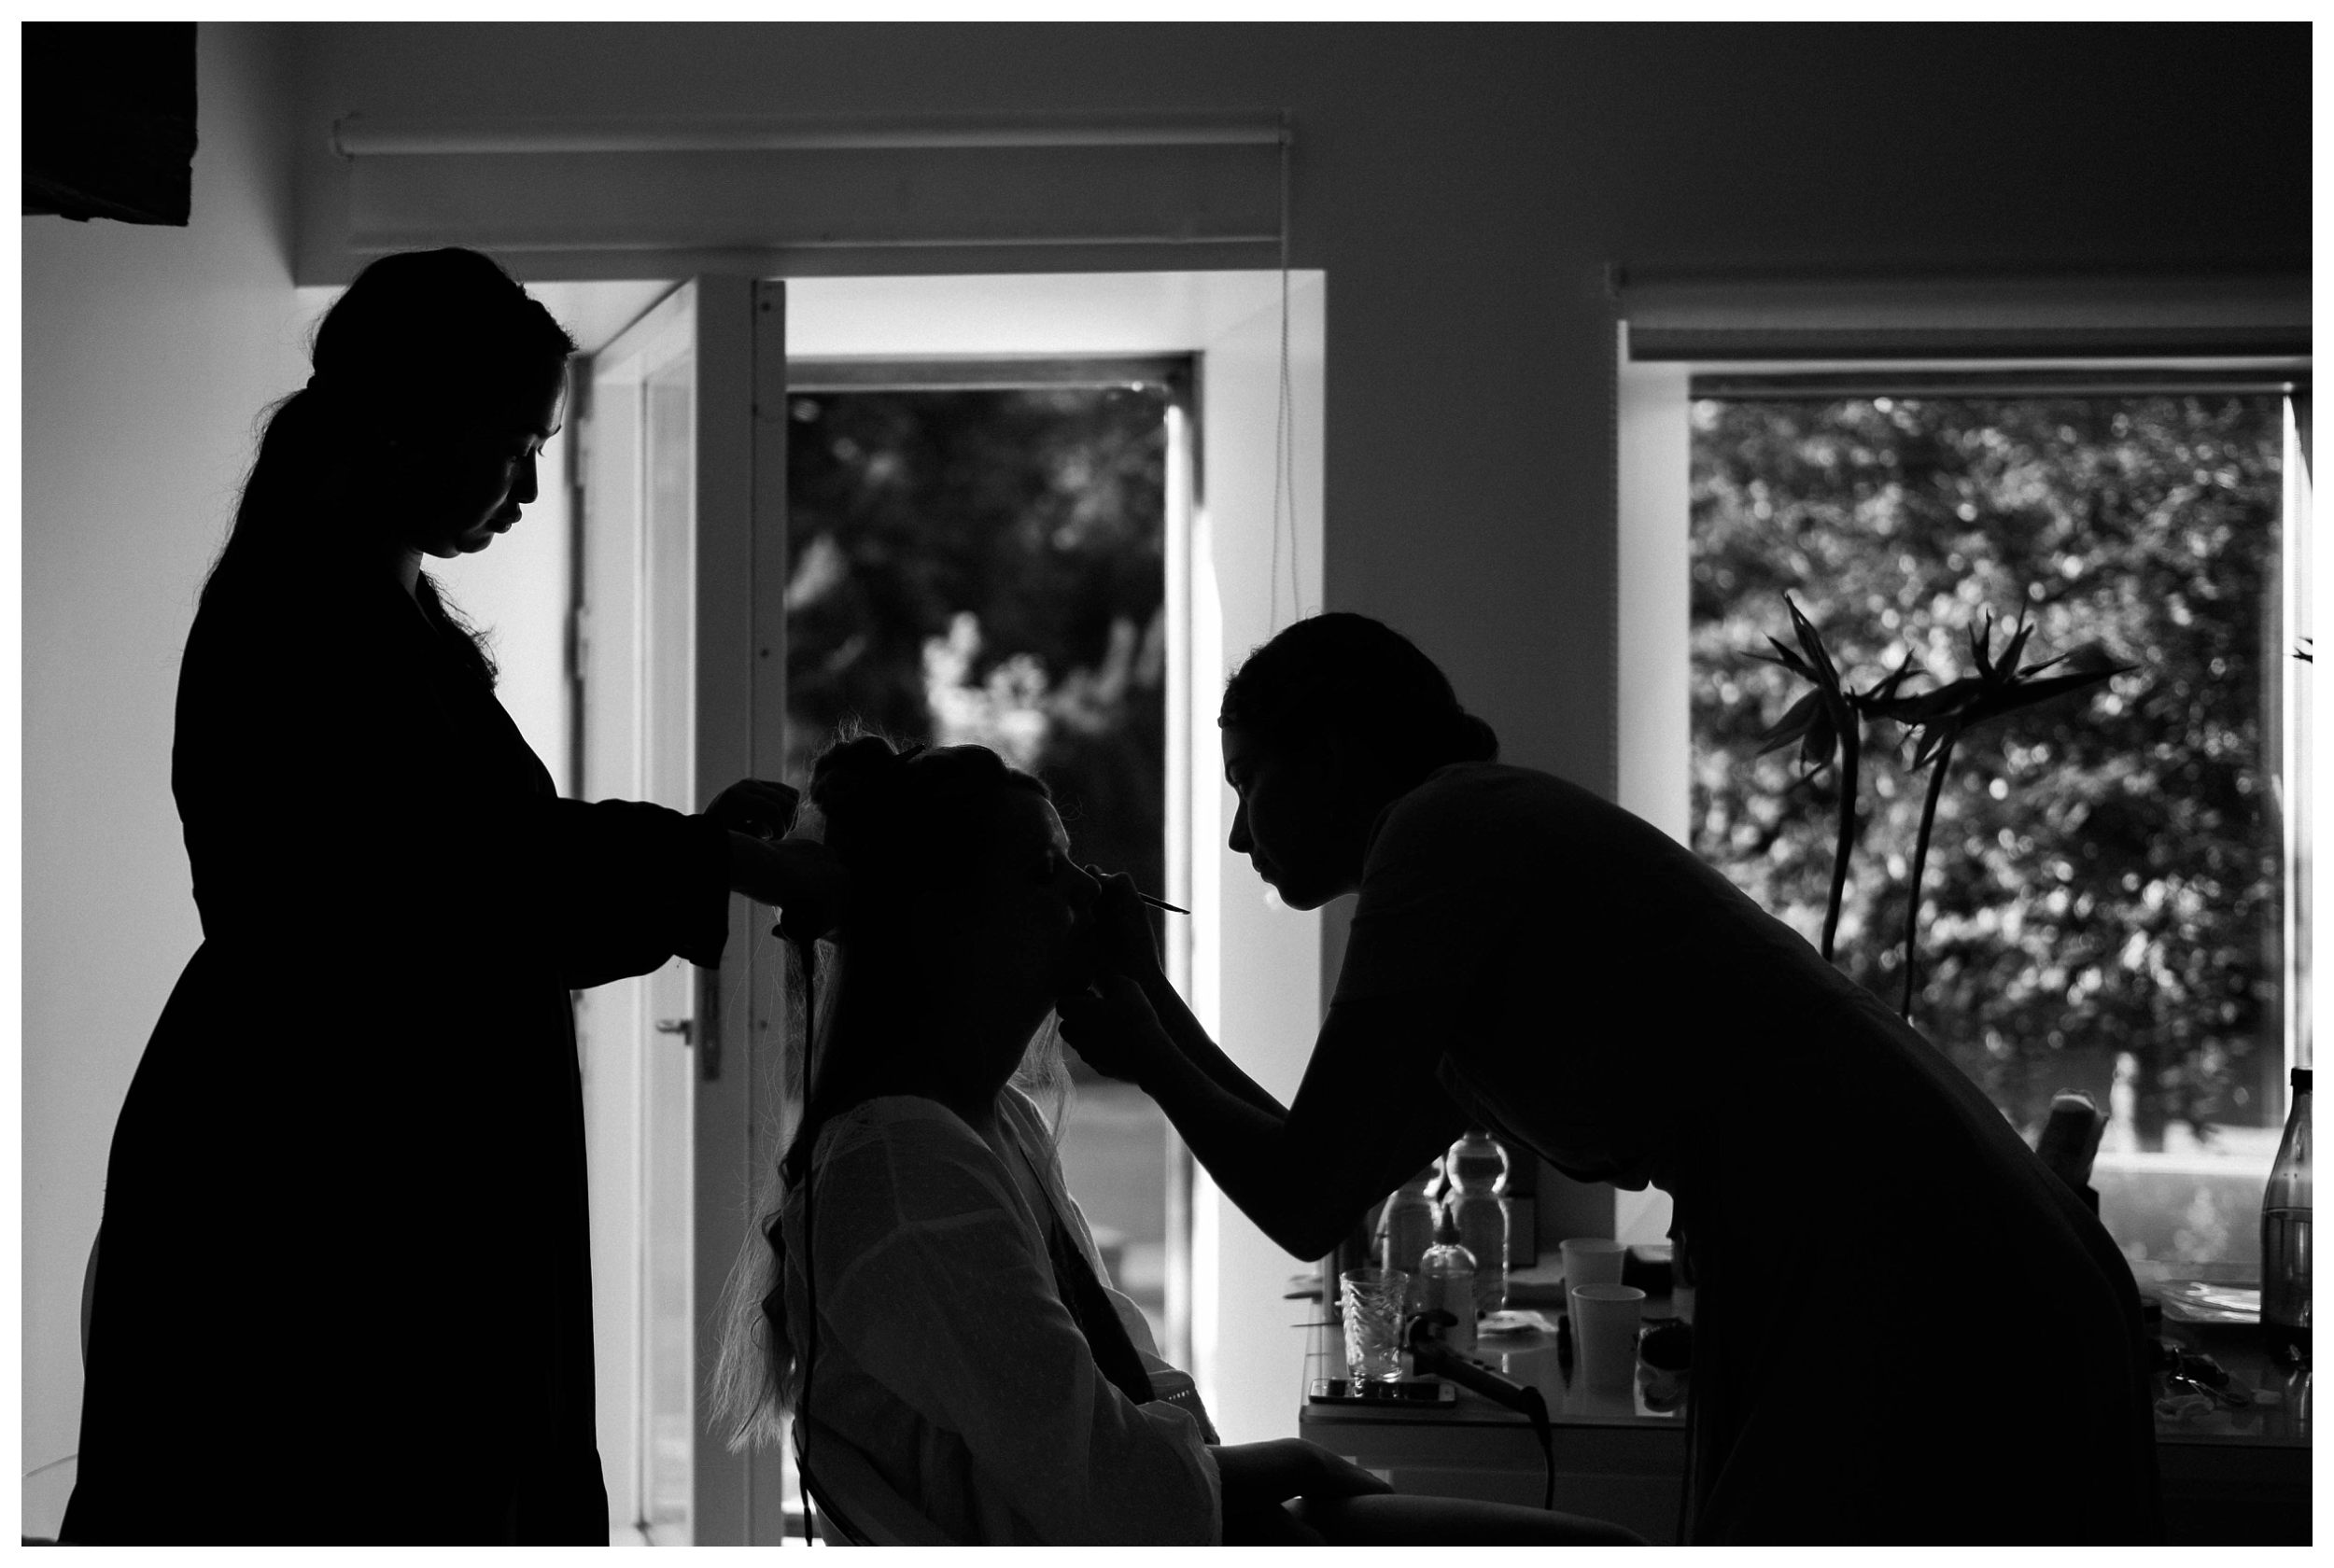 huwelijksfotograaf bruidsfotograaf destinationwedding huwelijksfotografie in ardennen nederland (9).jpg